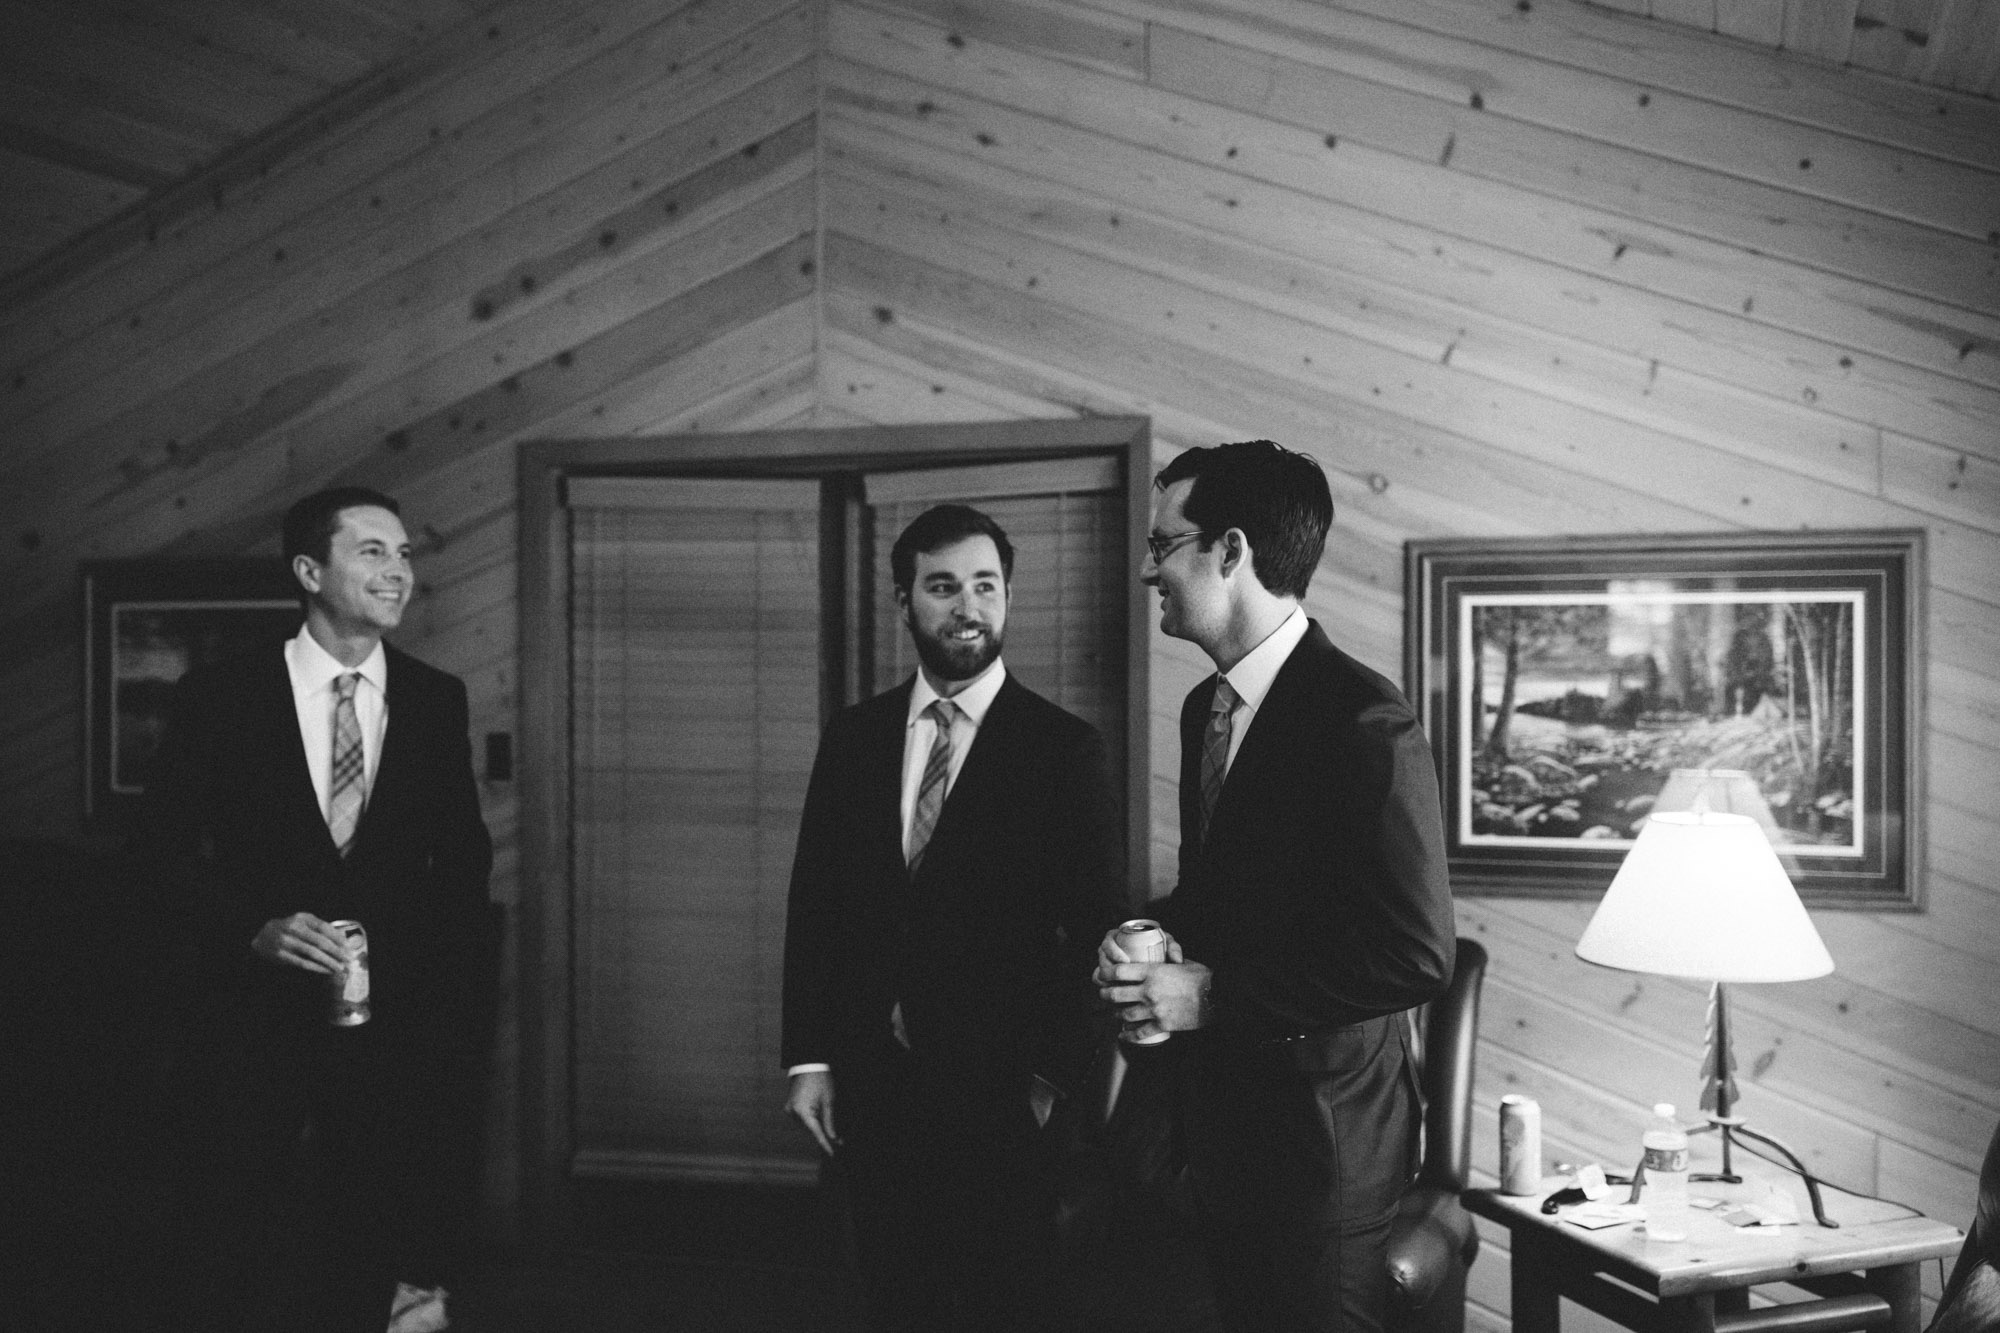 Groom and groomsmen in cabin at Grand View Lodge. Photography by Britt DeZeeuw, Brainerd Minnesota photographer.